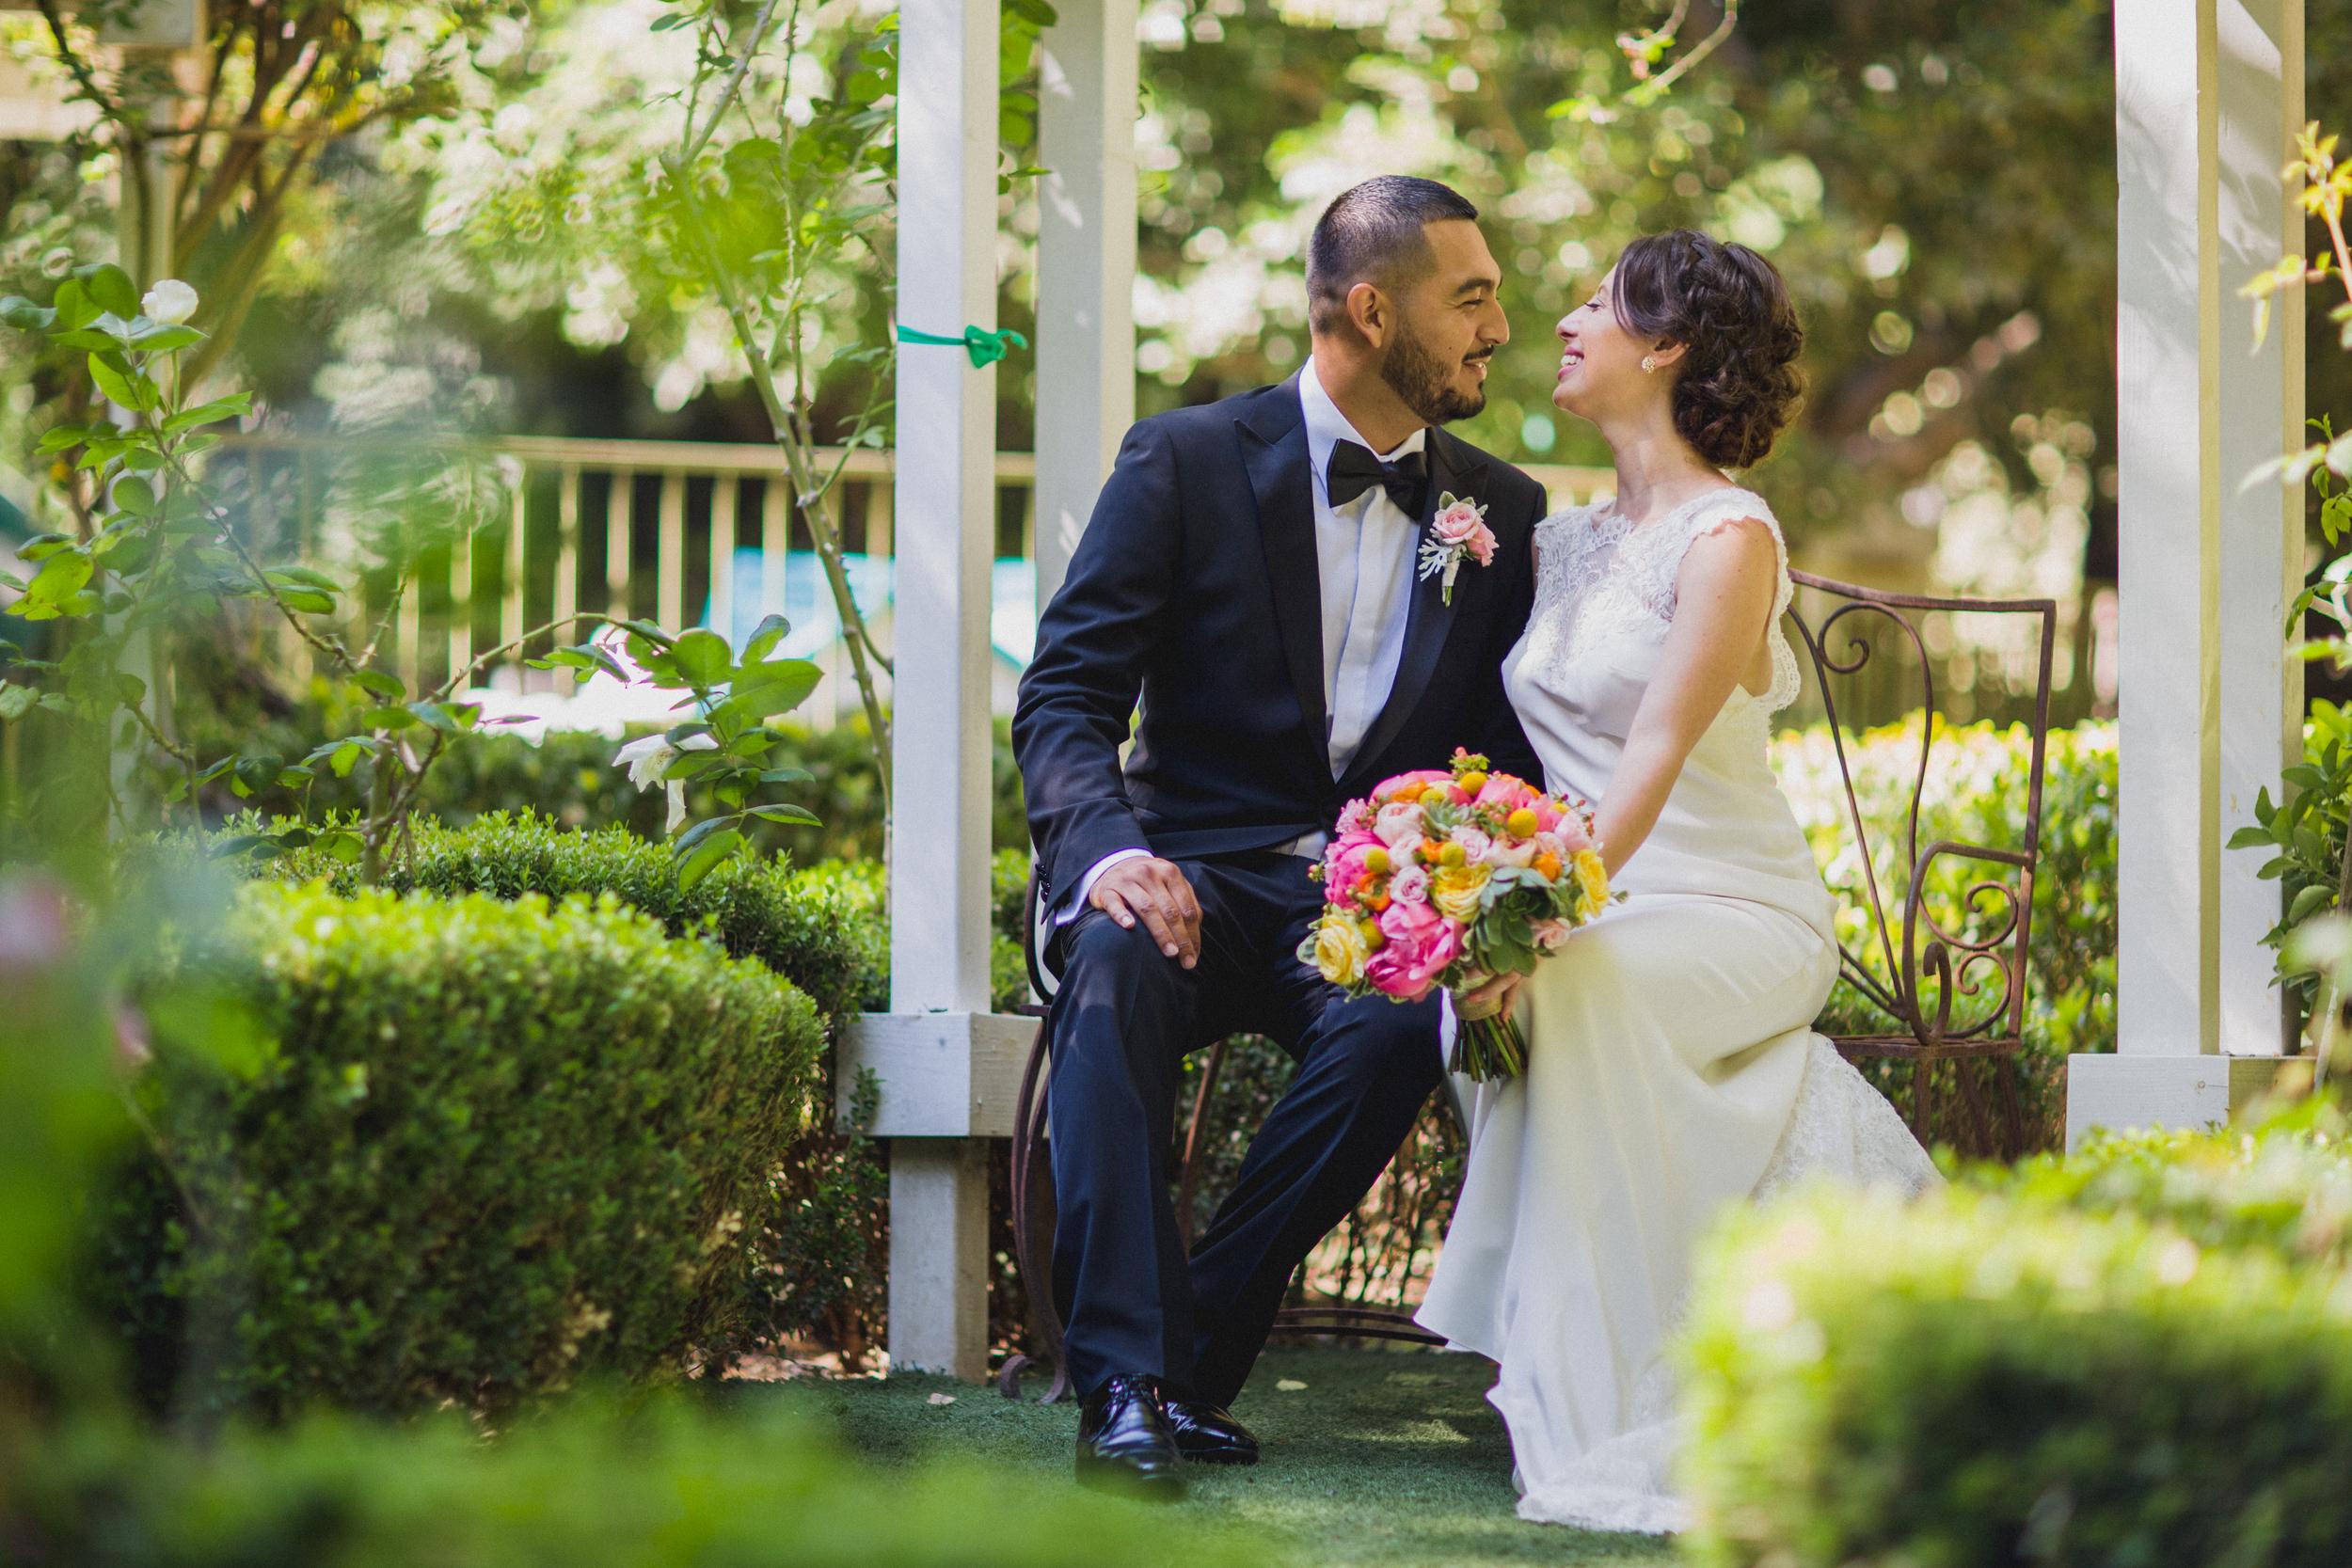 035 Hartley Botanica Wedding Photography Cotton Love Studios.jpg